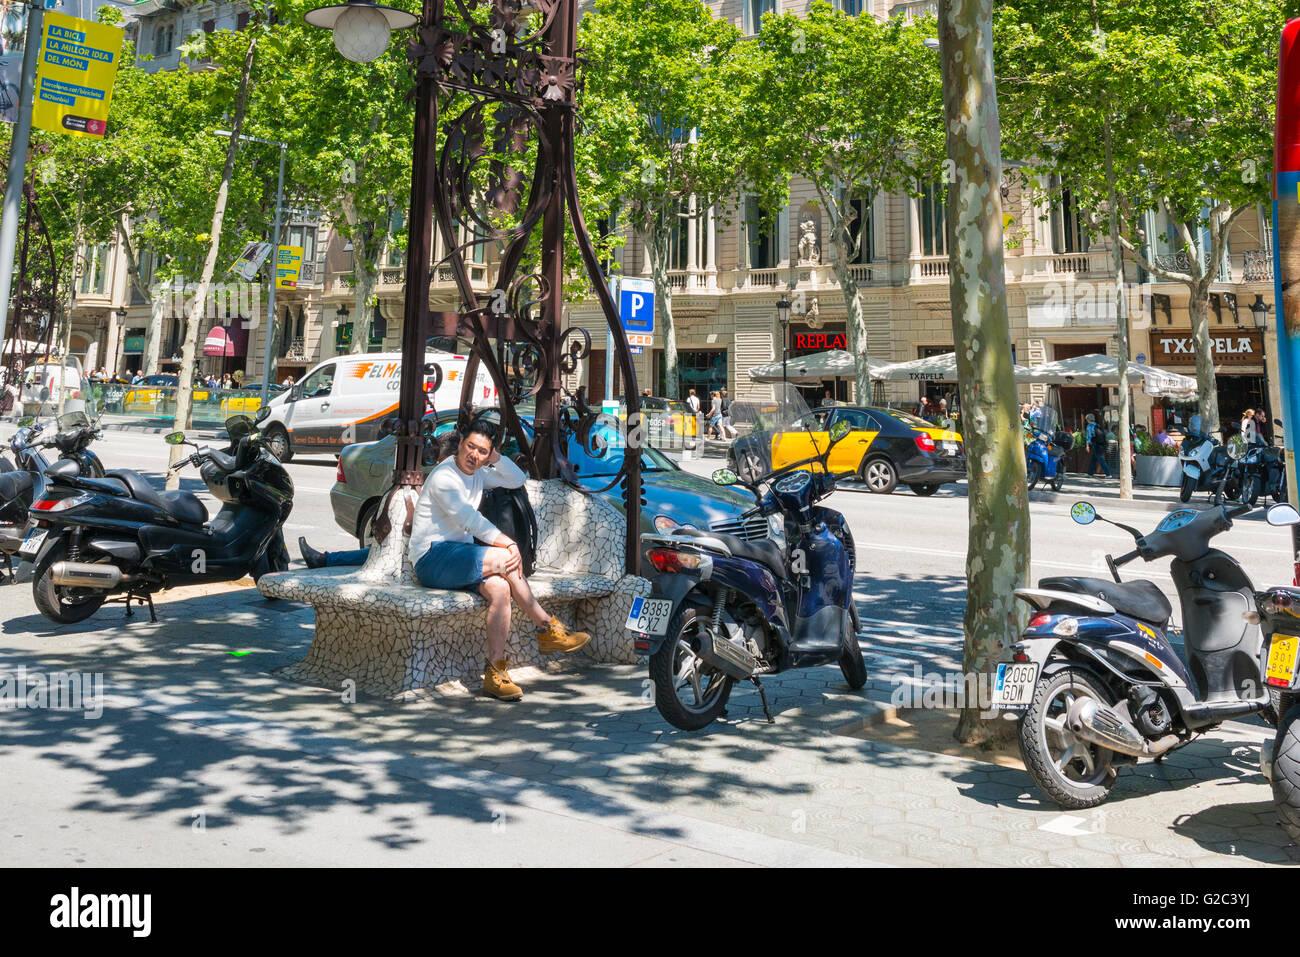 Spain Catalonia Barcelona Eixample Passeig de Gracia ornate Gaudi style combined bench seat & street standard - Stock Image